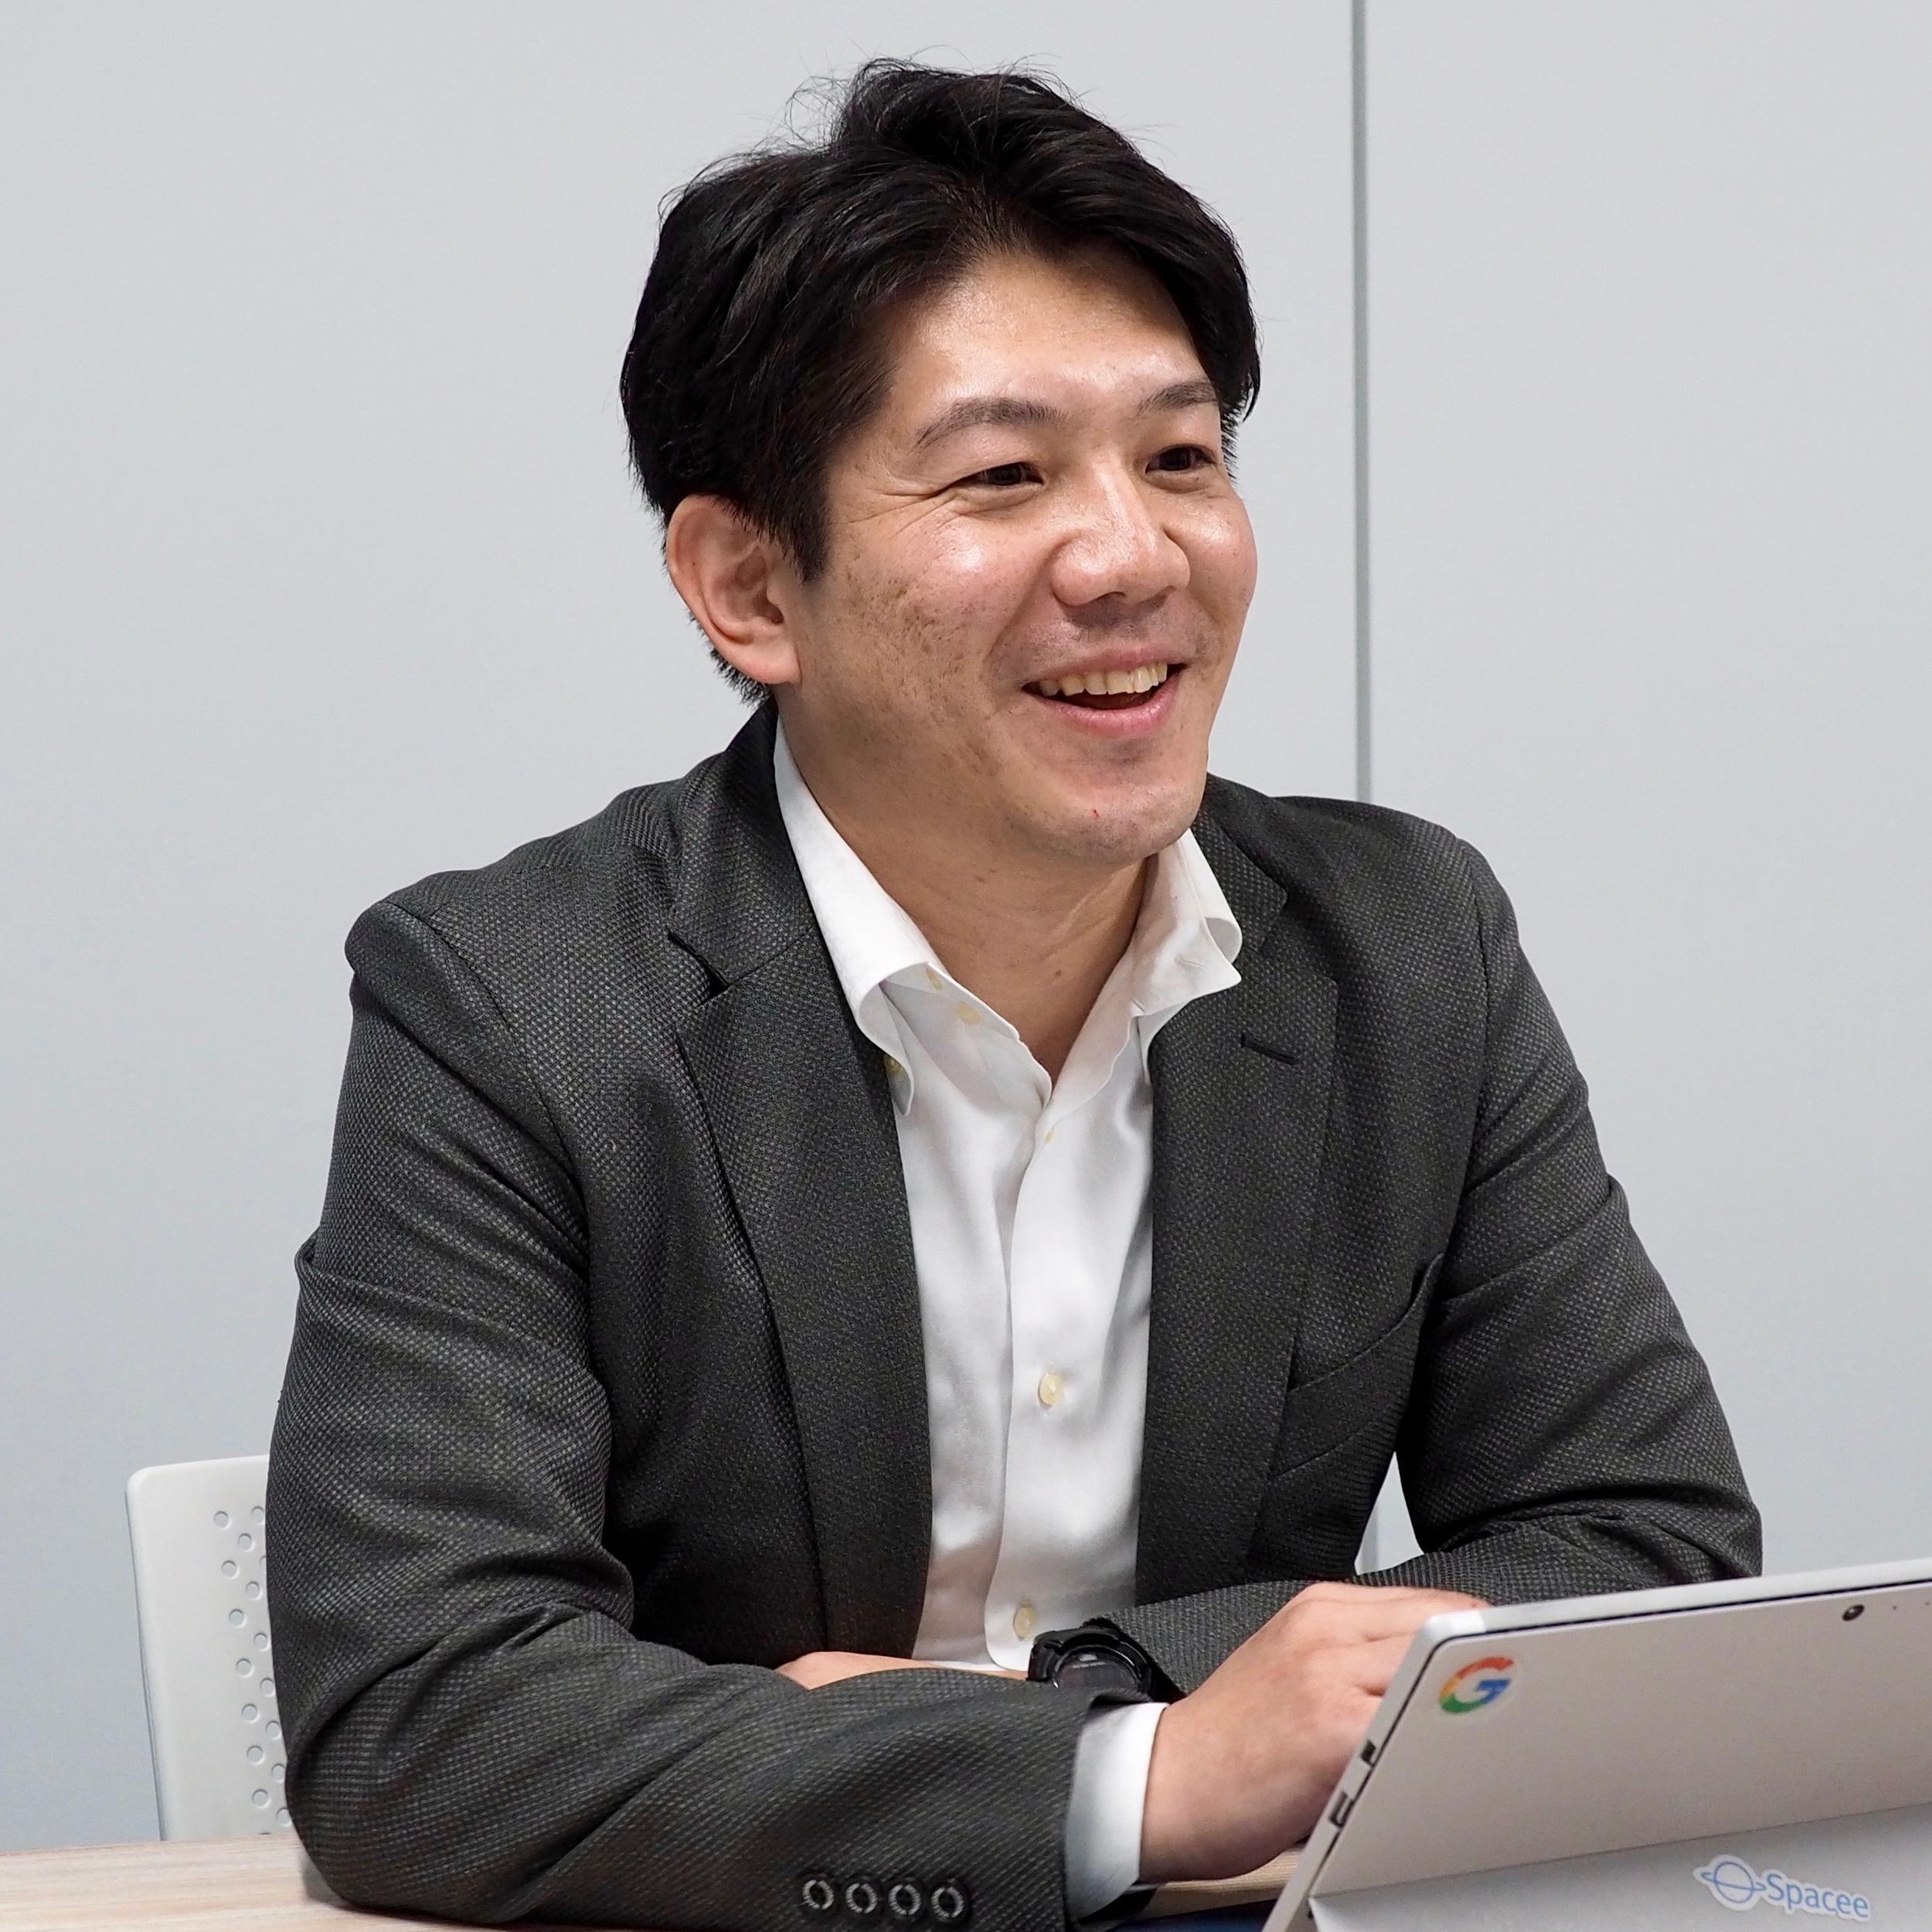 株式会社スペイシー執行役員 武田 正史氏